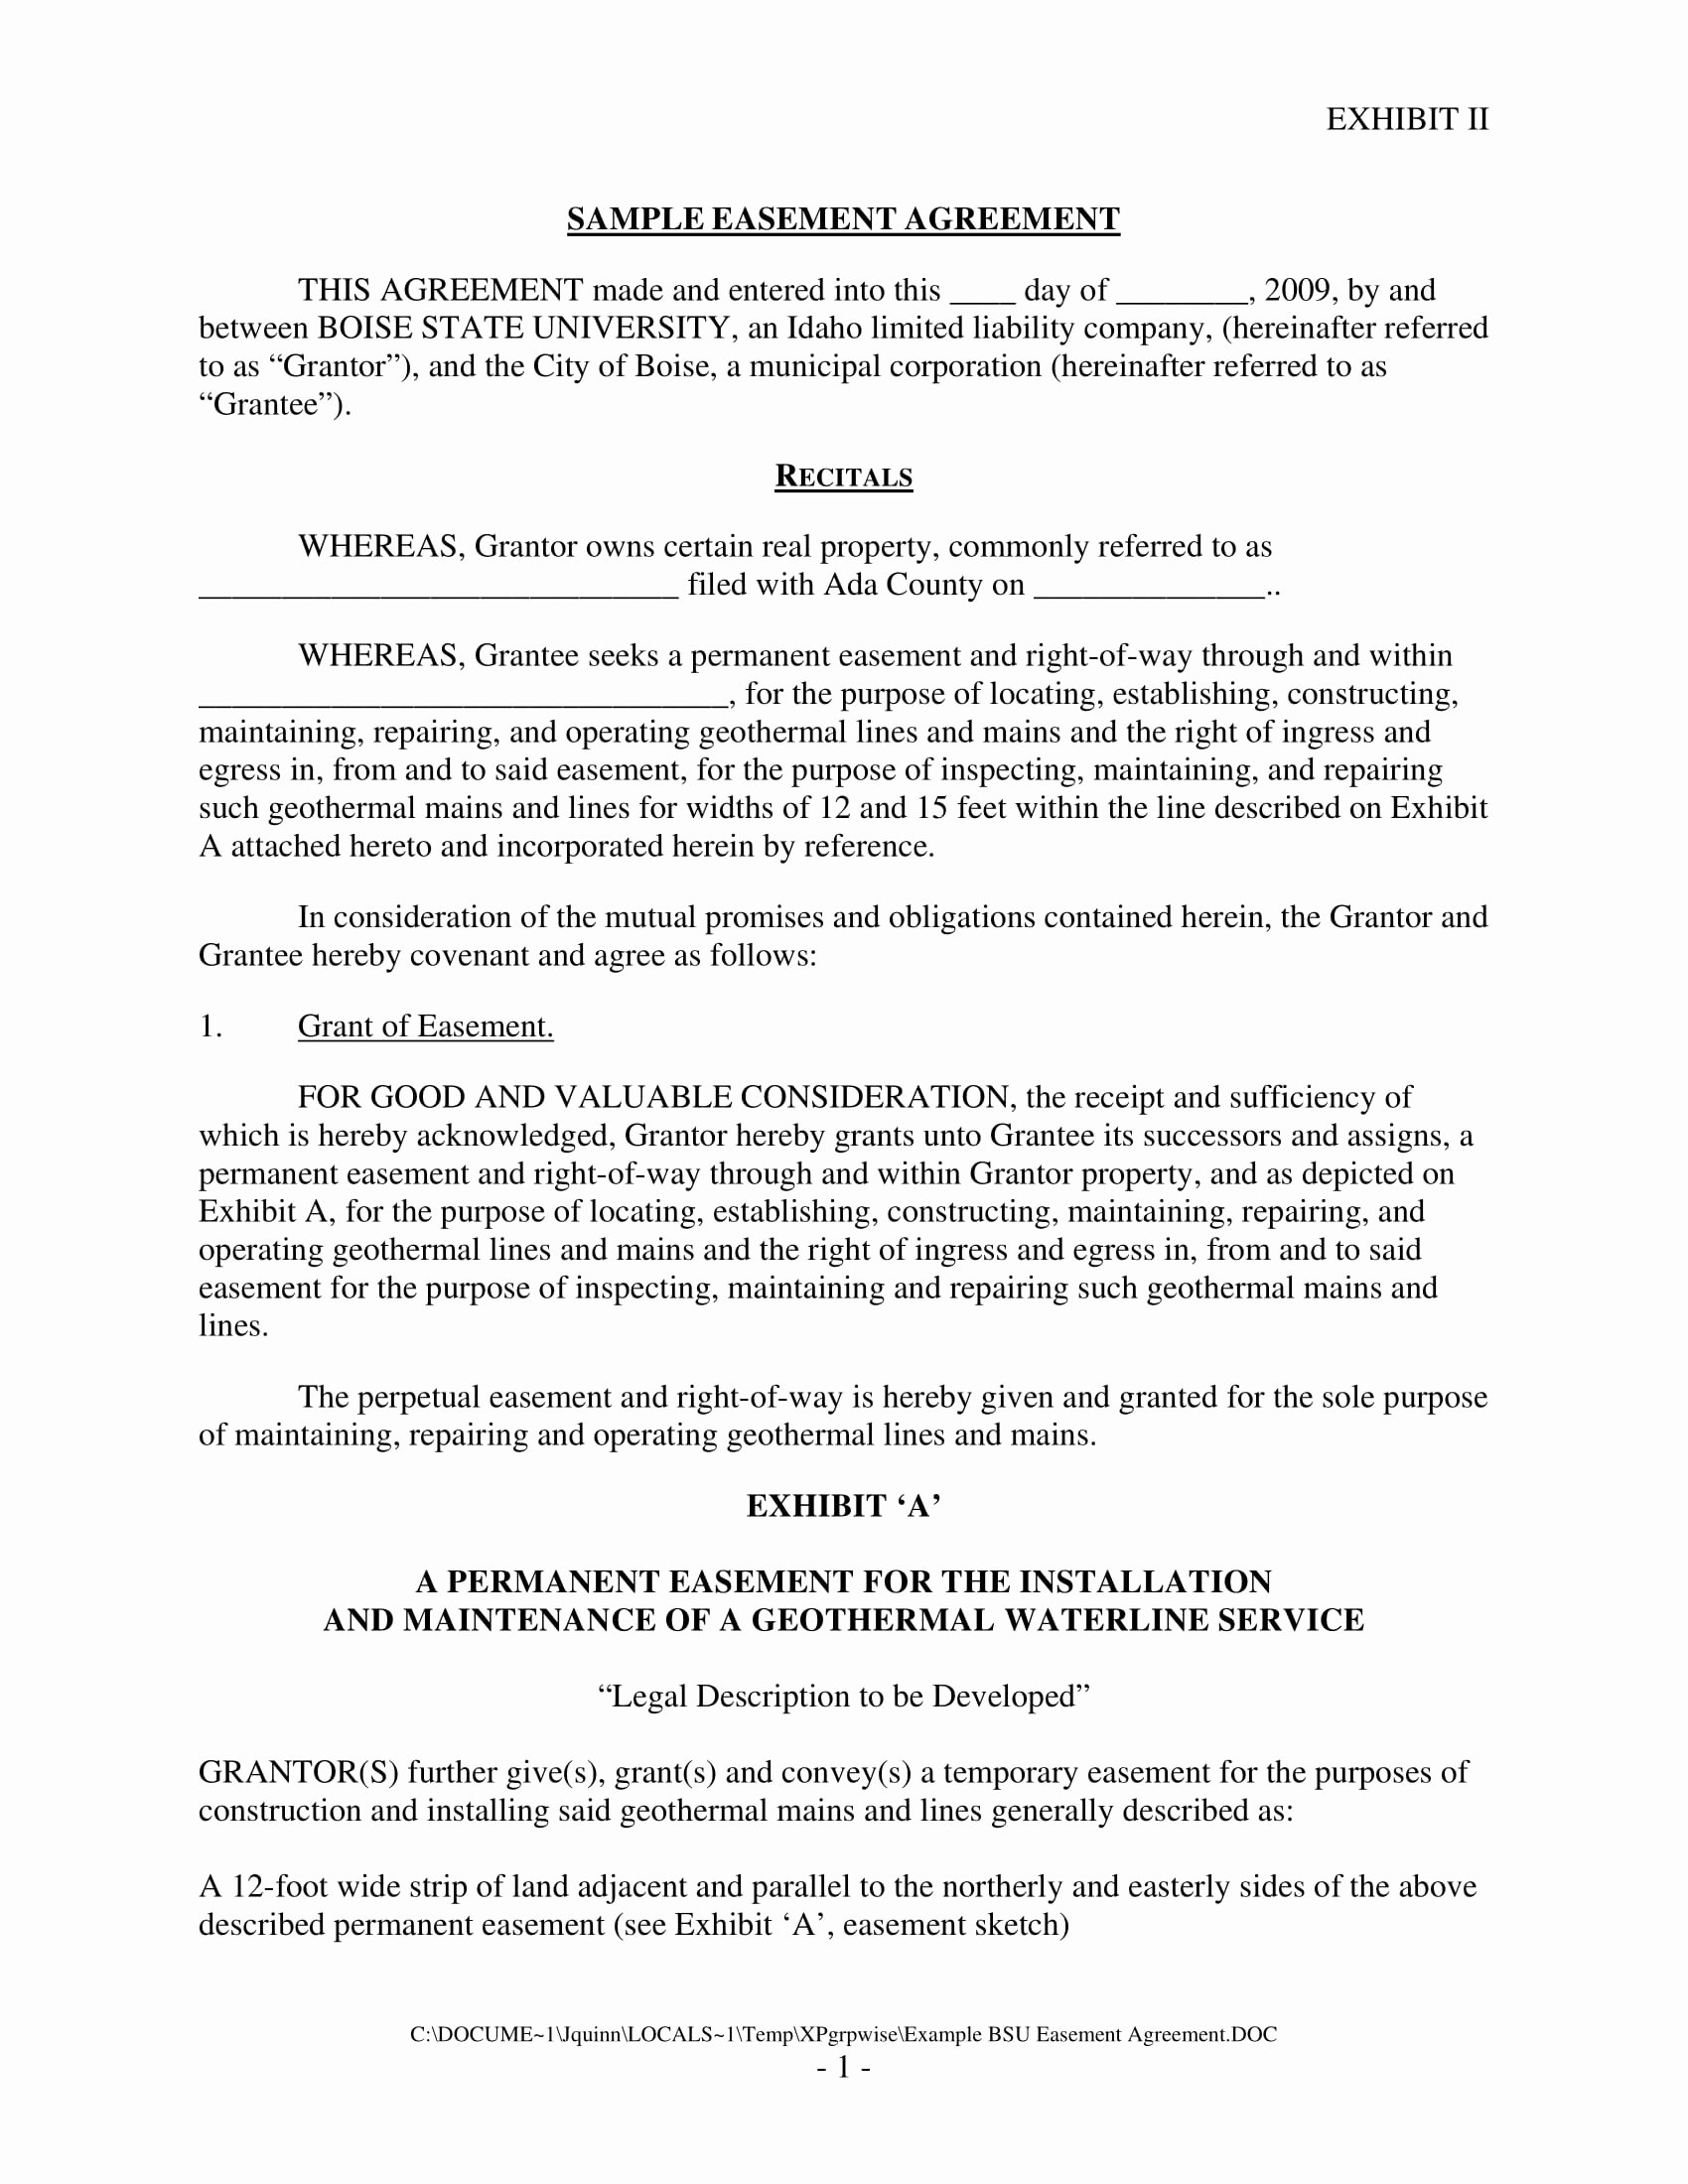 Sample Driveway Easement Agreement Inspirational Easement Agreement Example